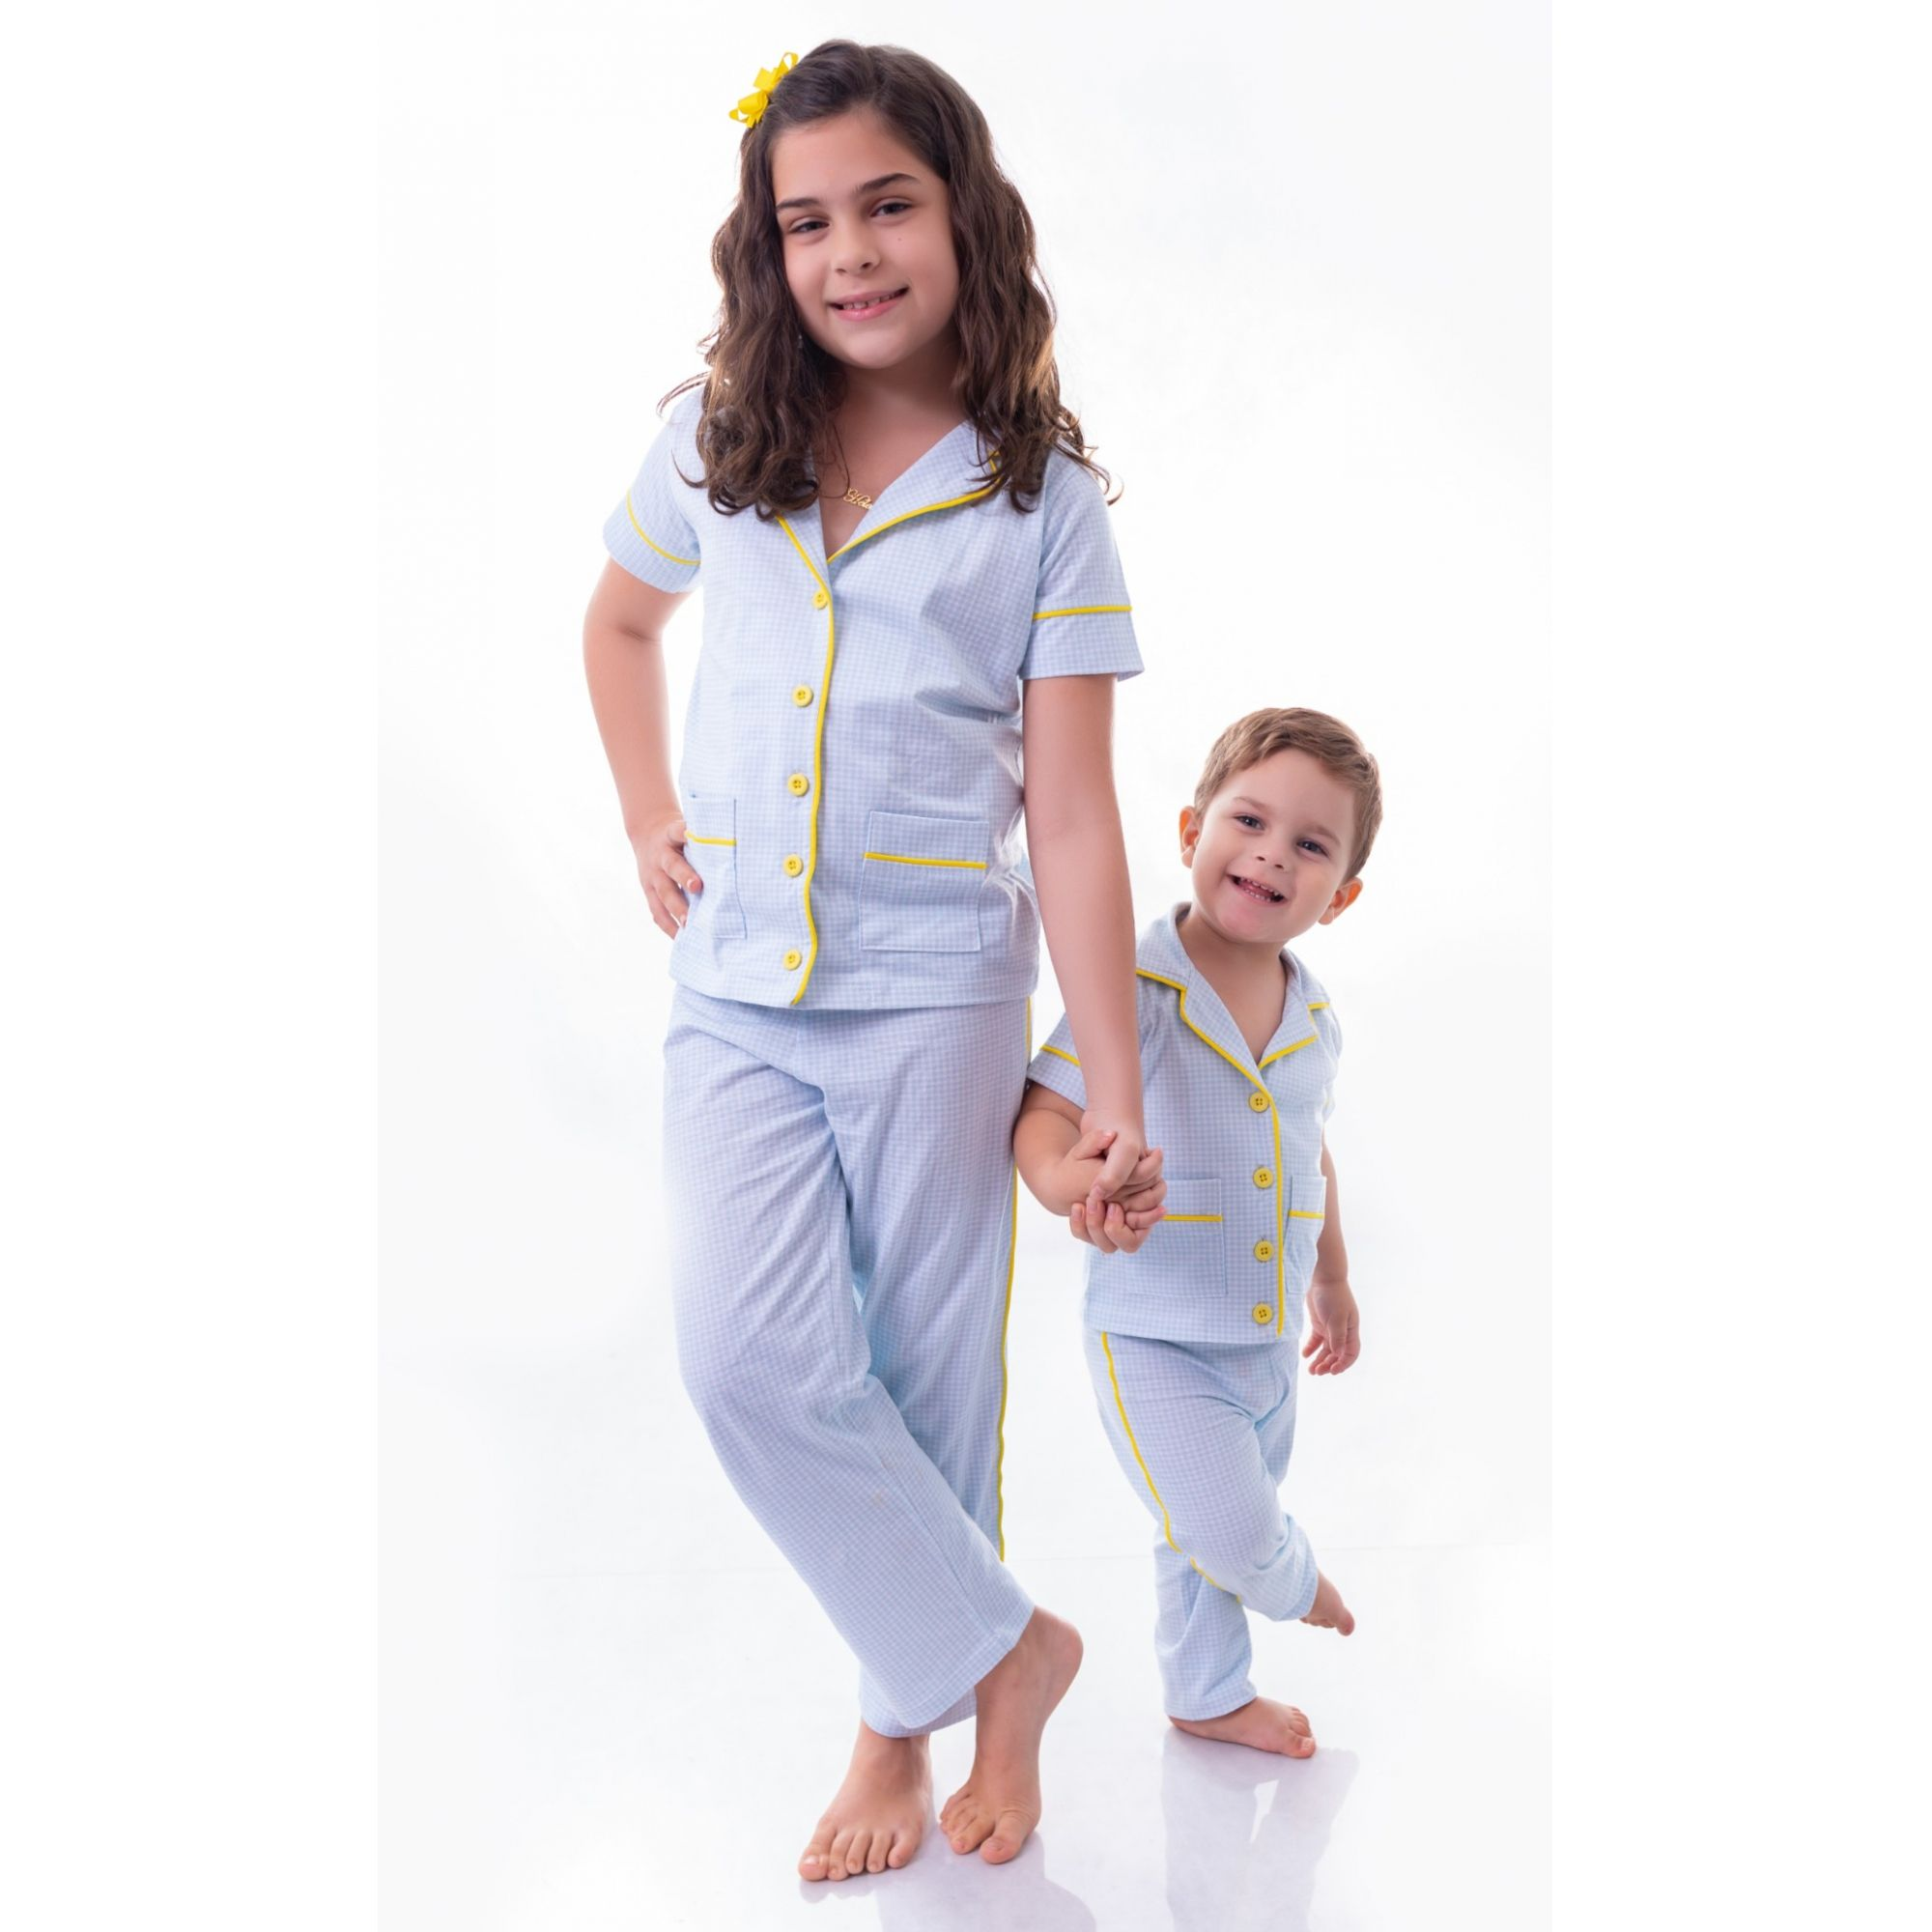 Pijama Tal Mãe Tal Filhos da criança